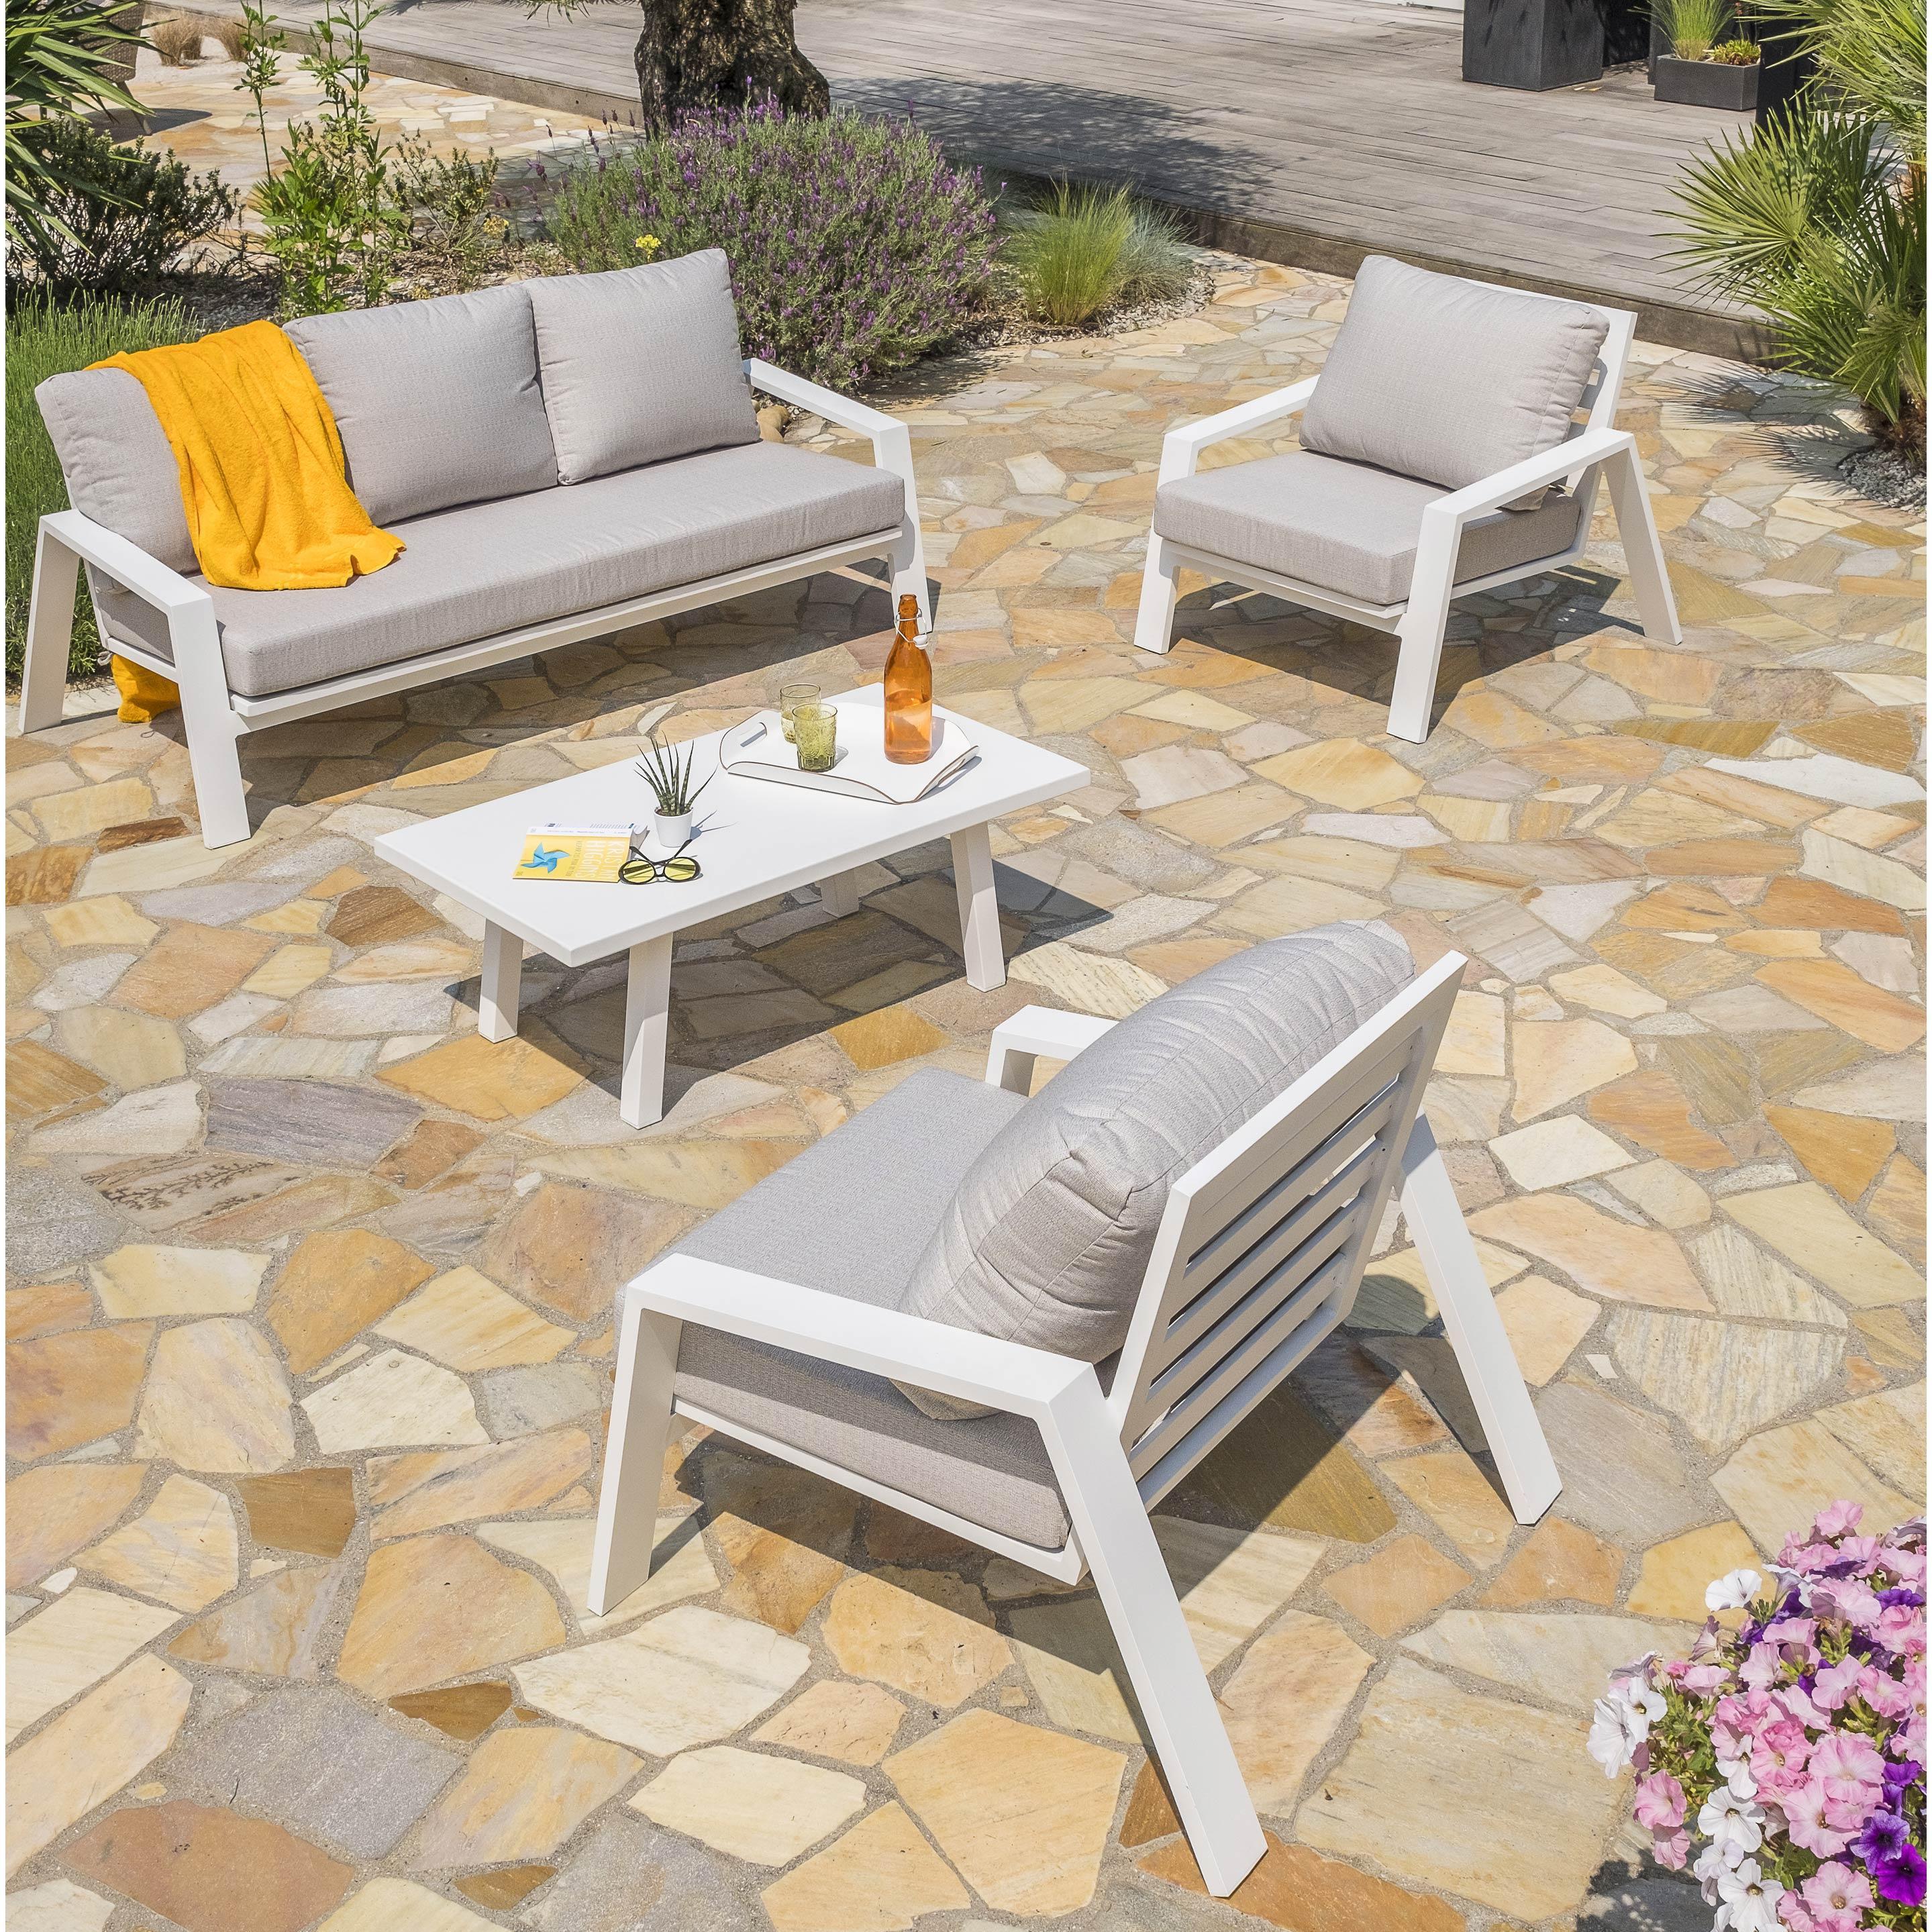 Salon Bas De Jardin Ibiza Aluminium Blanc, 5 Personnes pour Salon De Jardin Blanc